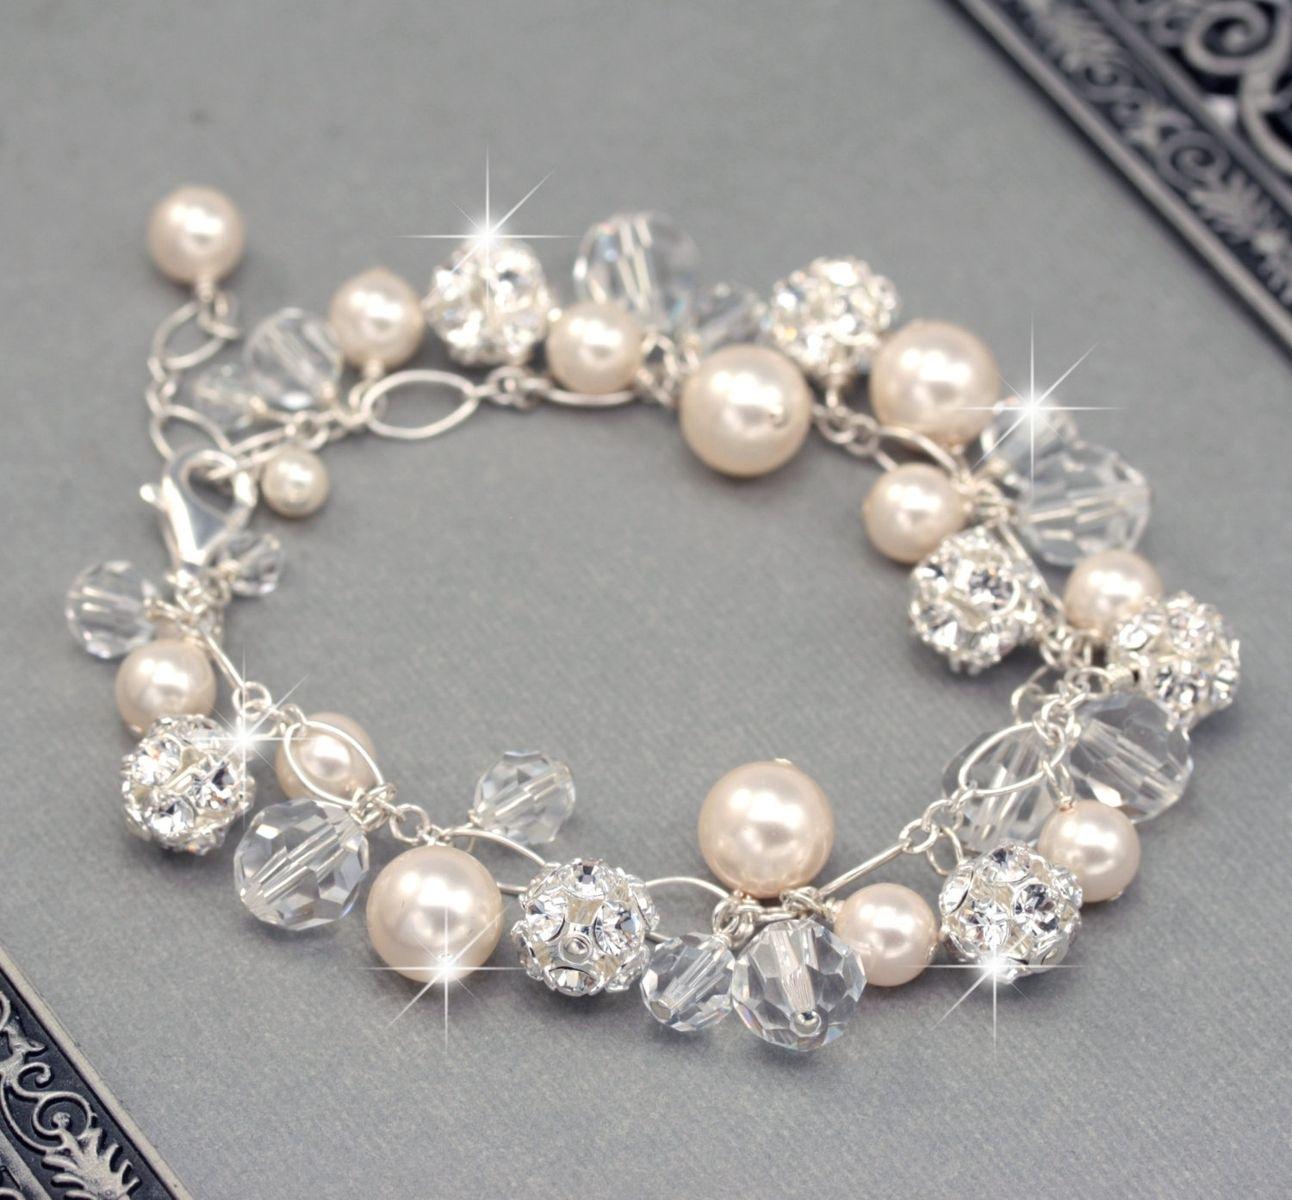 Buy Hand Crafted Bridal Bracelet - Swarovski Crystals 7518b32072